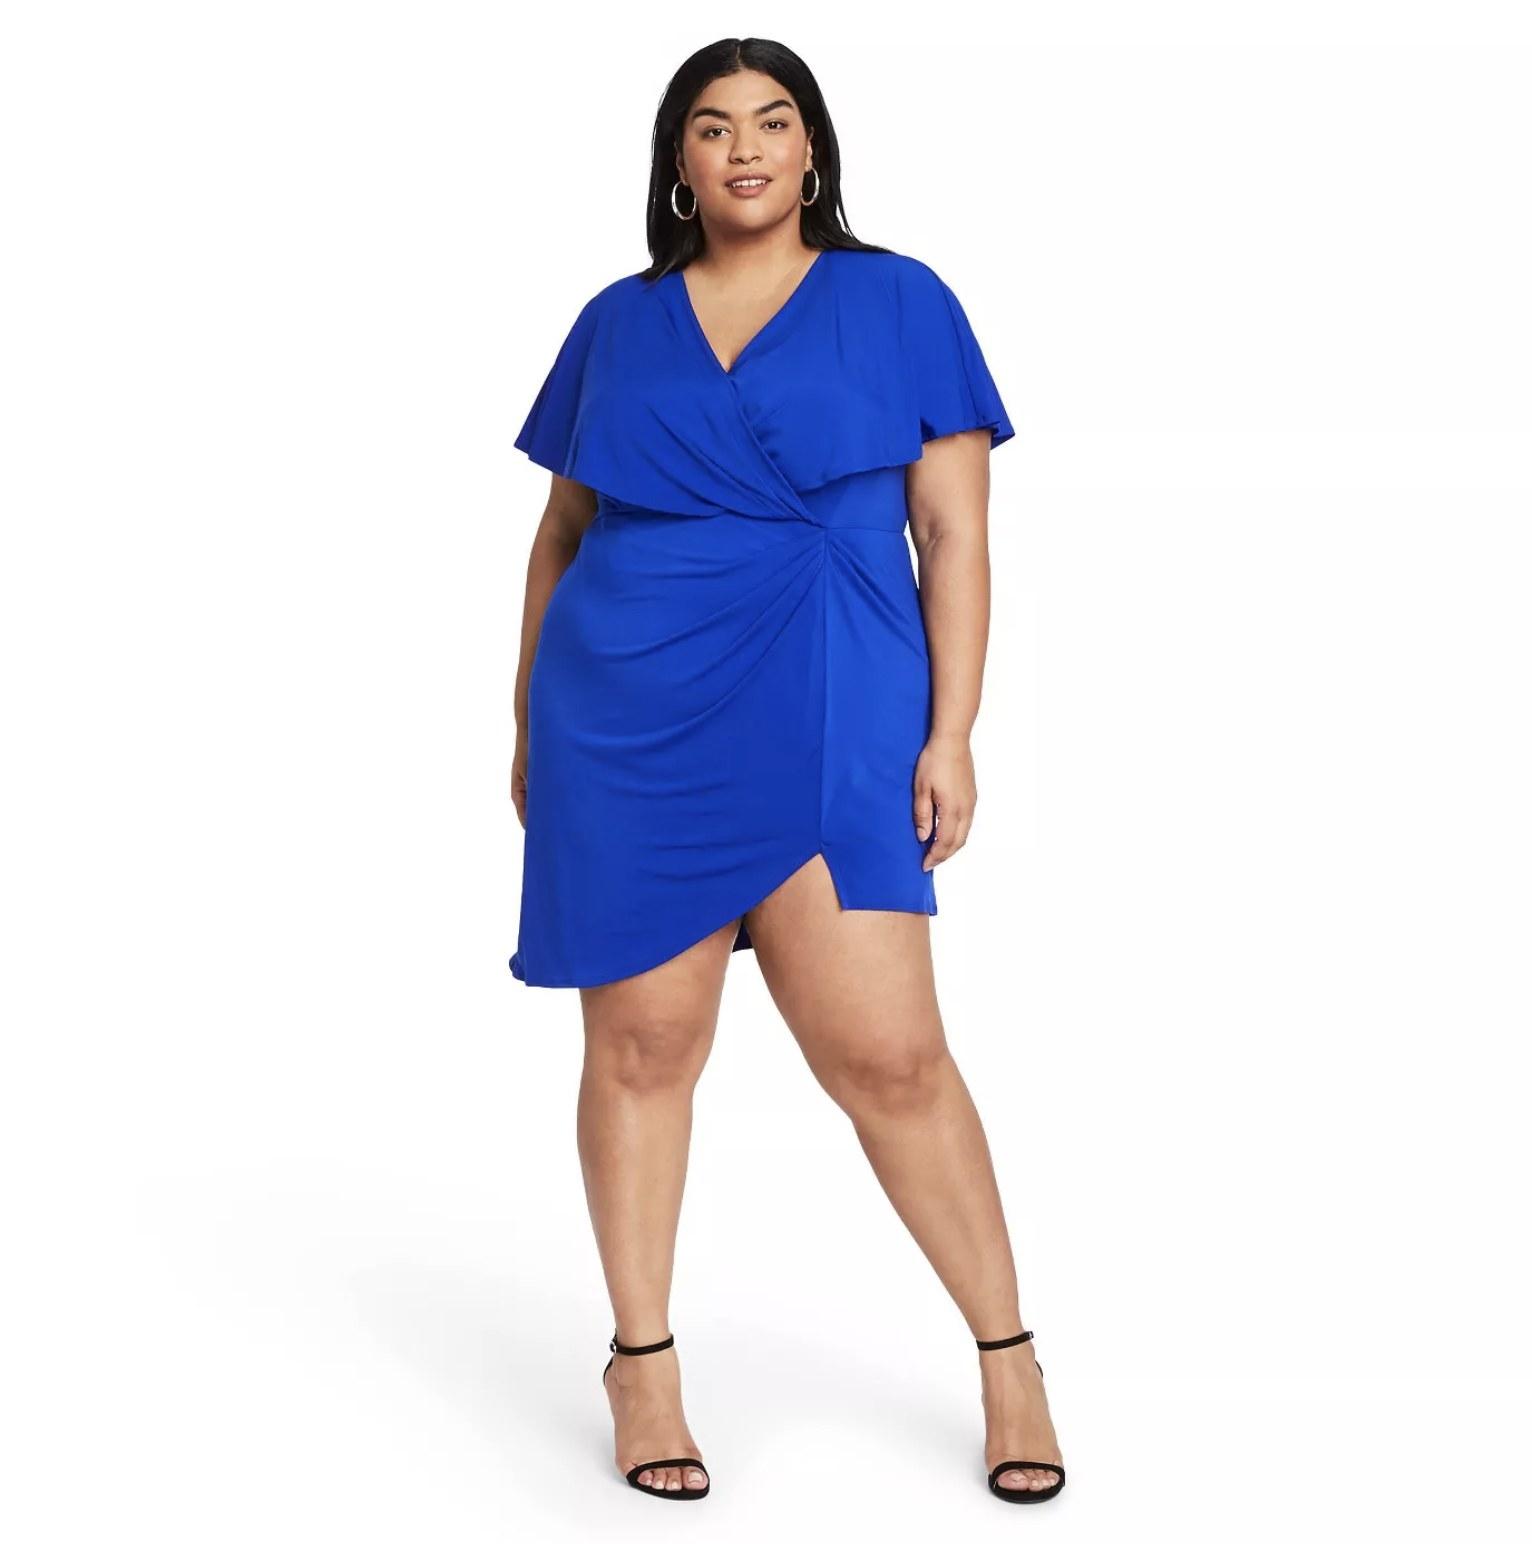 model wearing royal blue V-neck mini dress